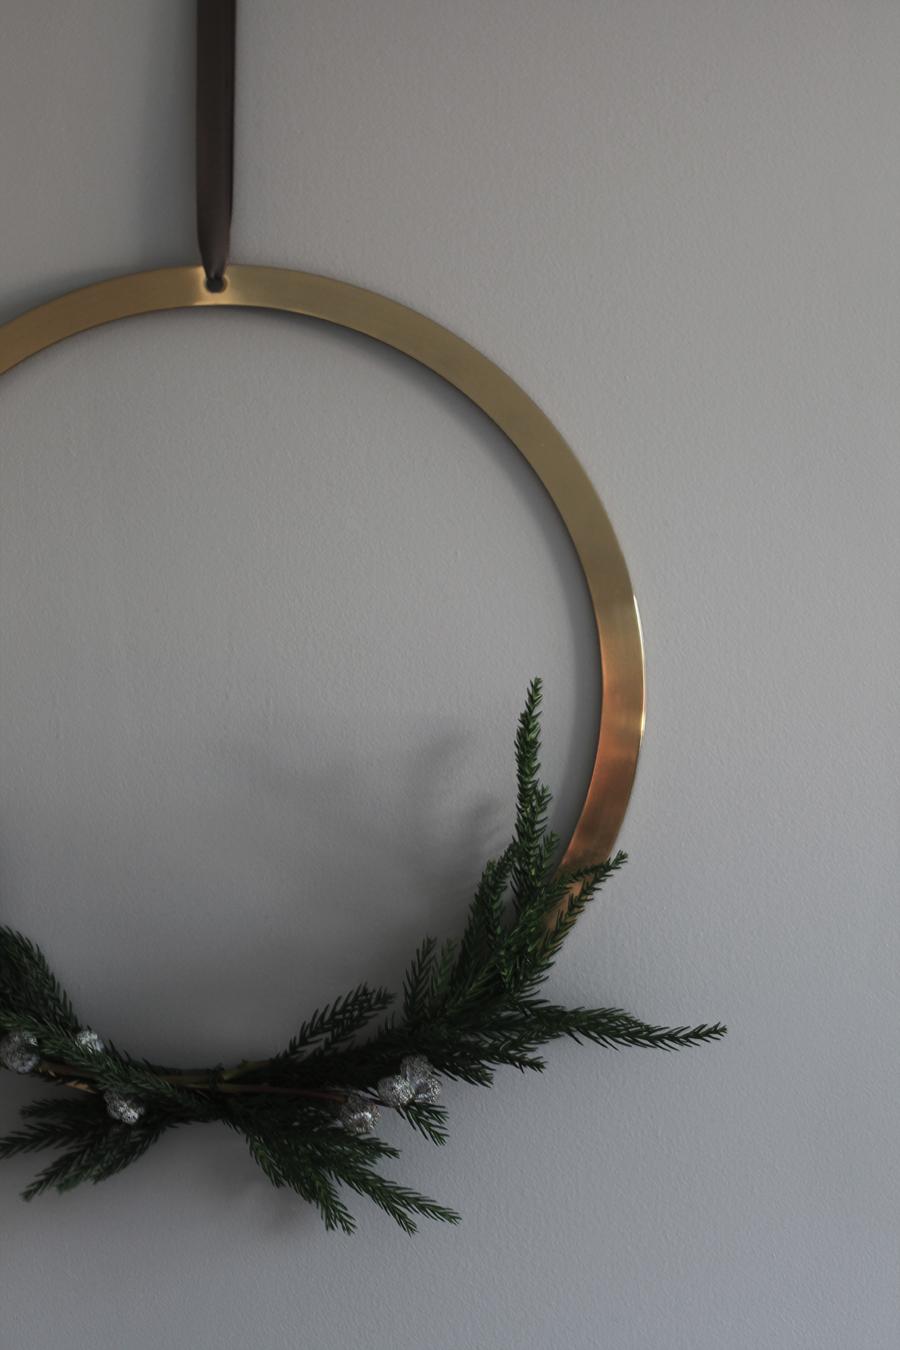 cooee wreath by elisabeth heier